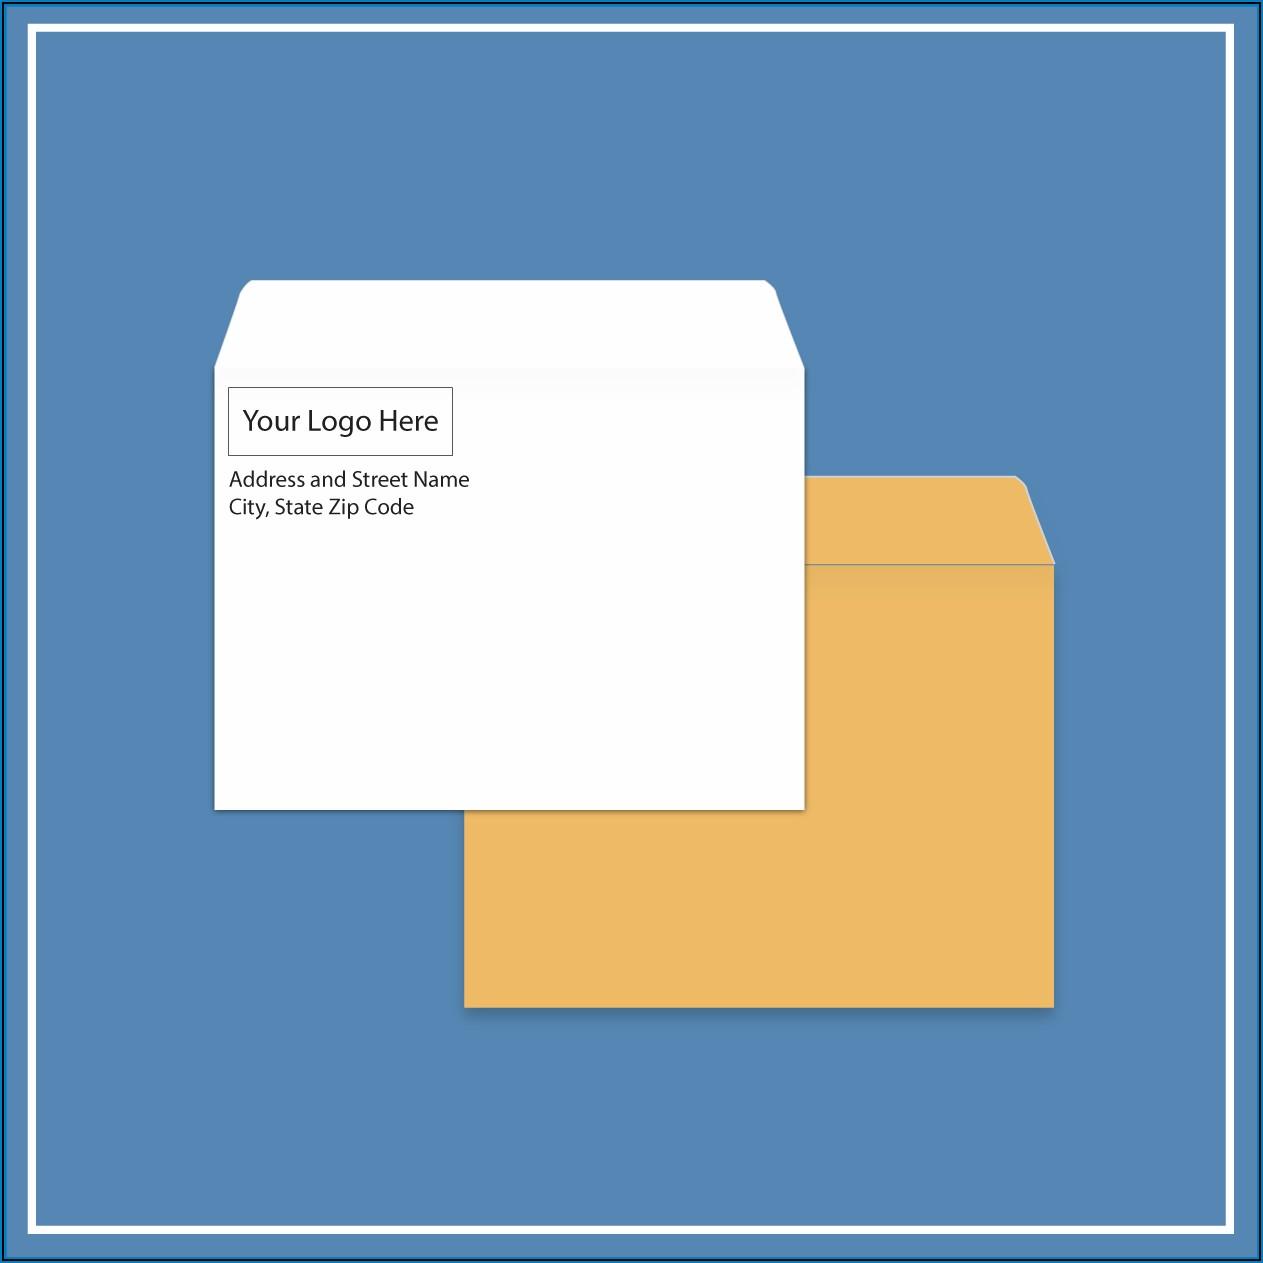 6 X 9 Booklet Window Envelope Template